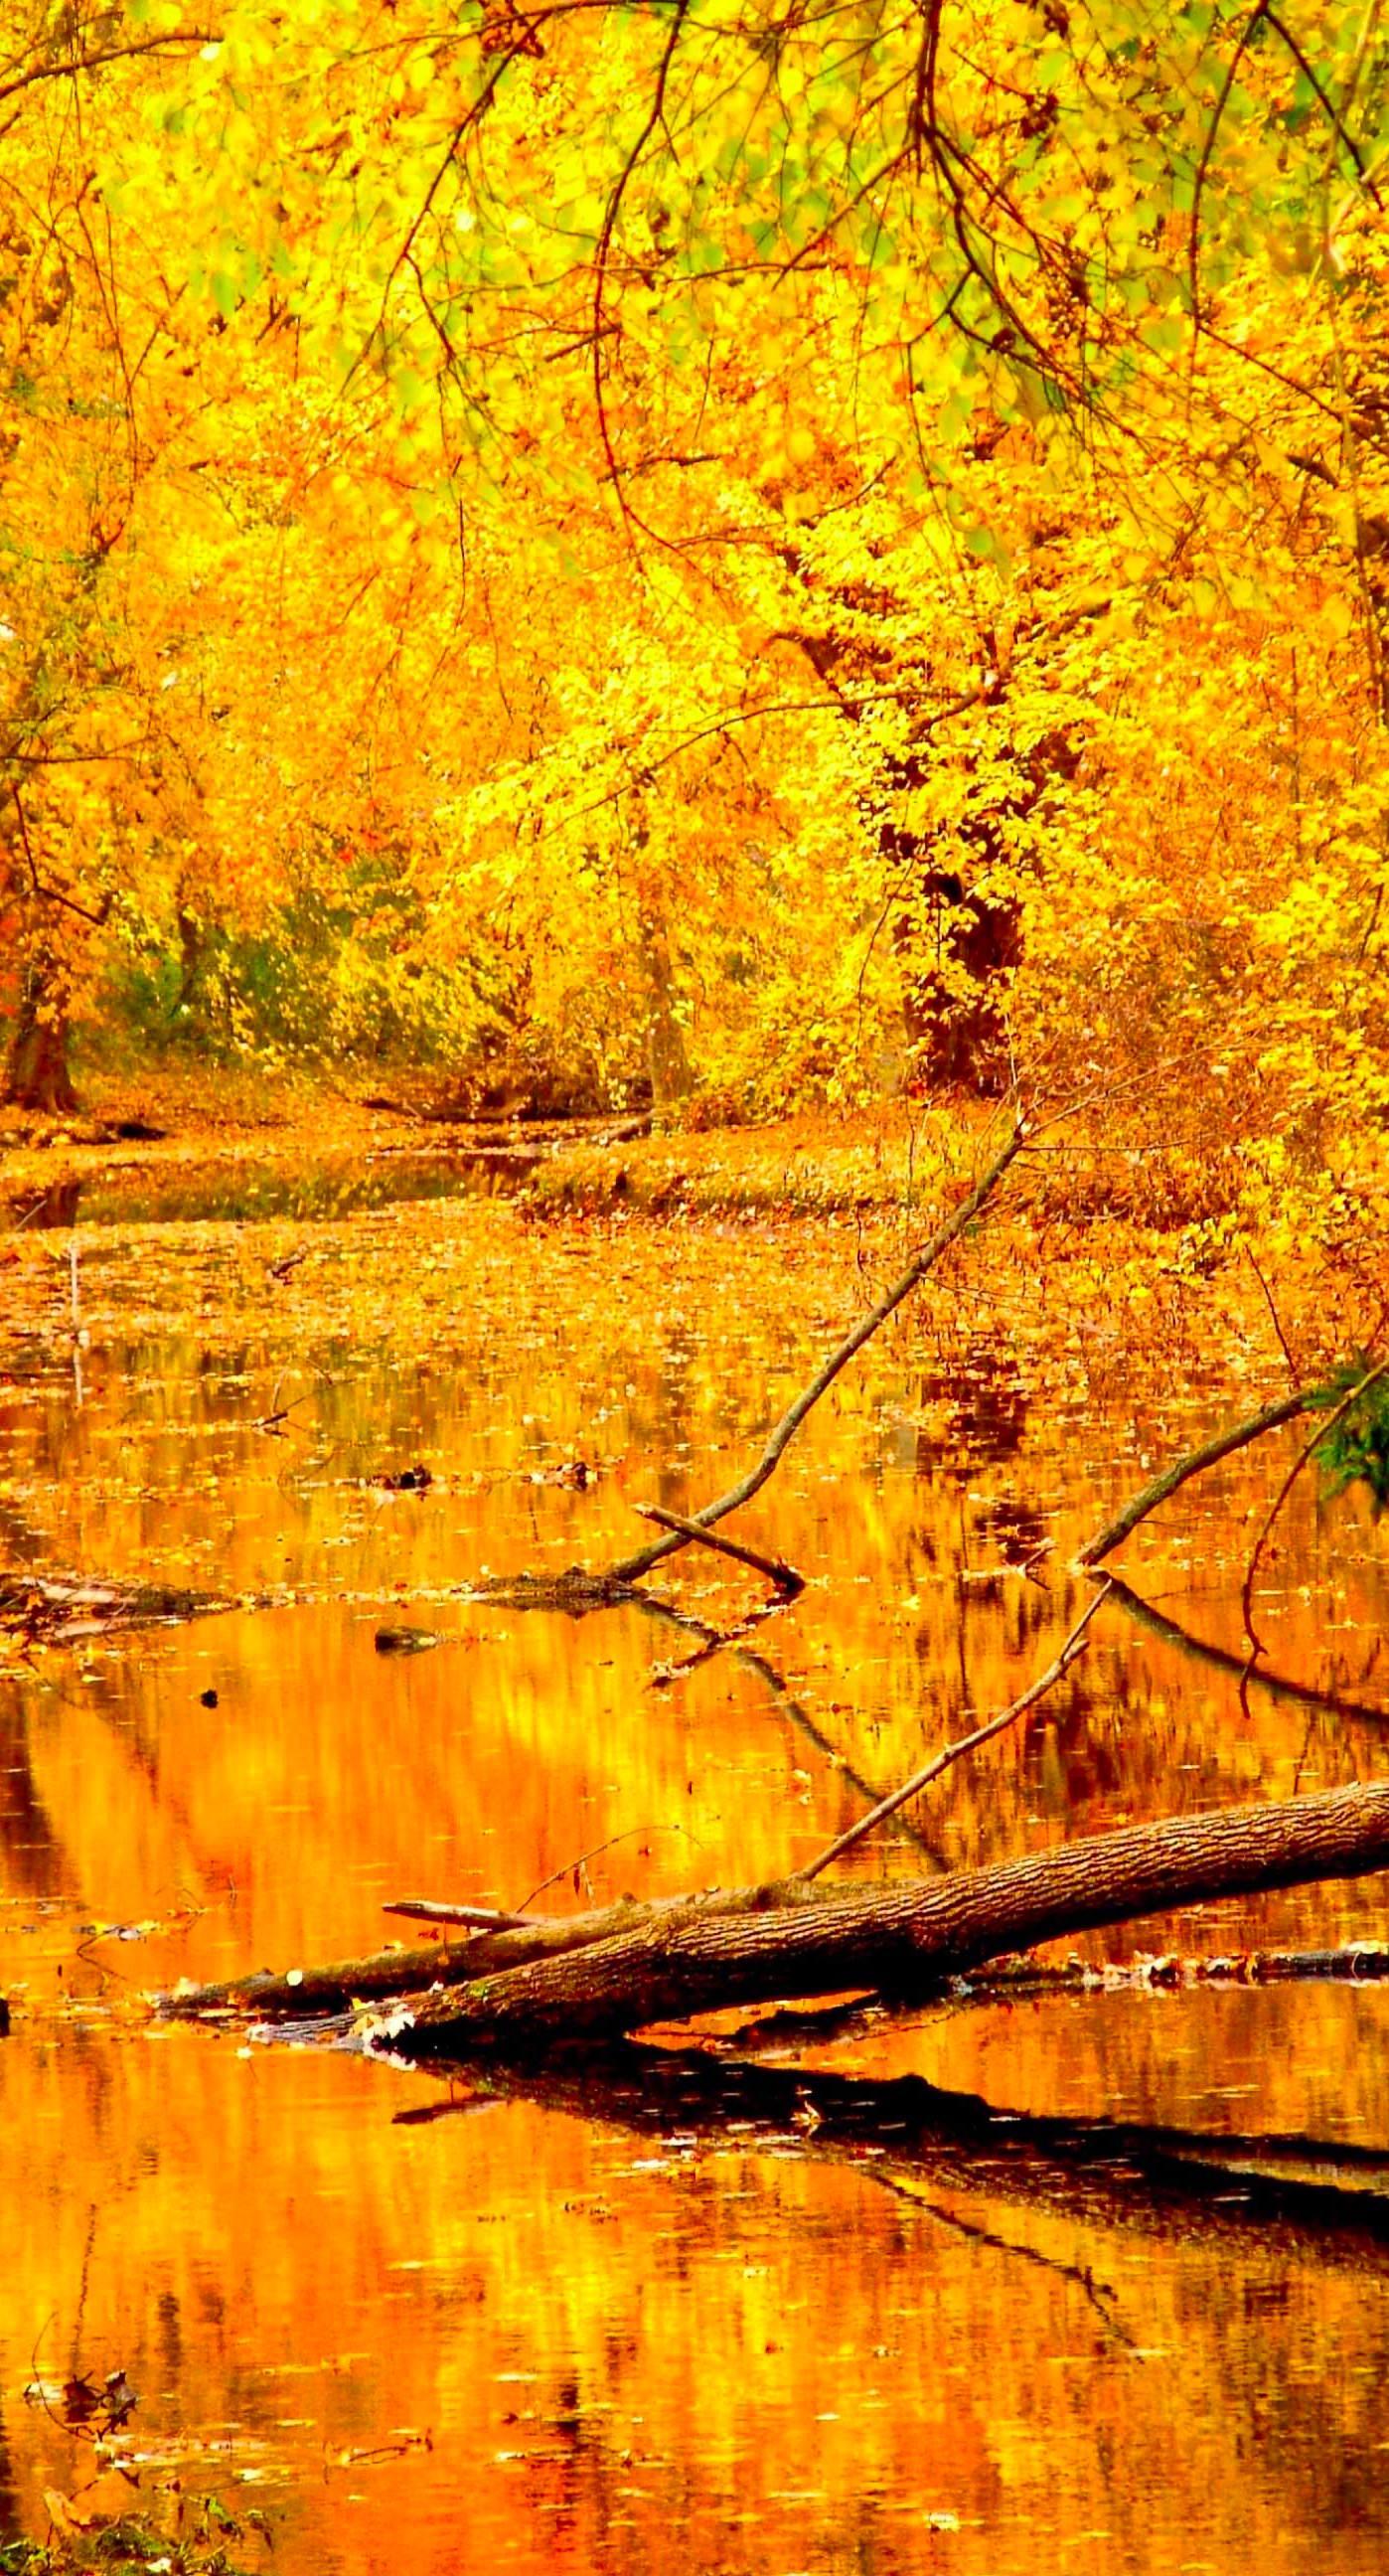 Rain Fall Hd Wallpapers Fall Iphone Wallpapers Pixelstalk Net